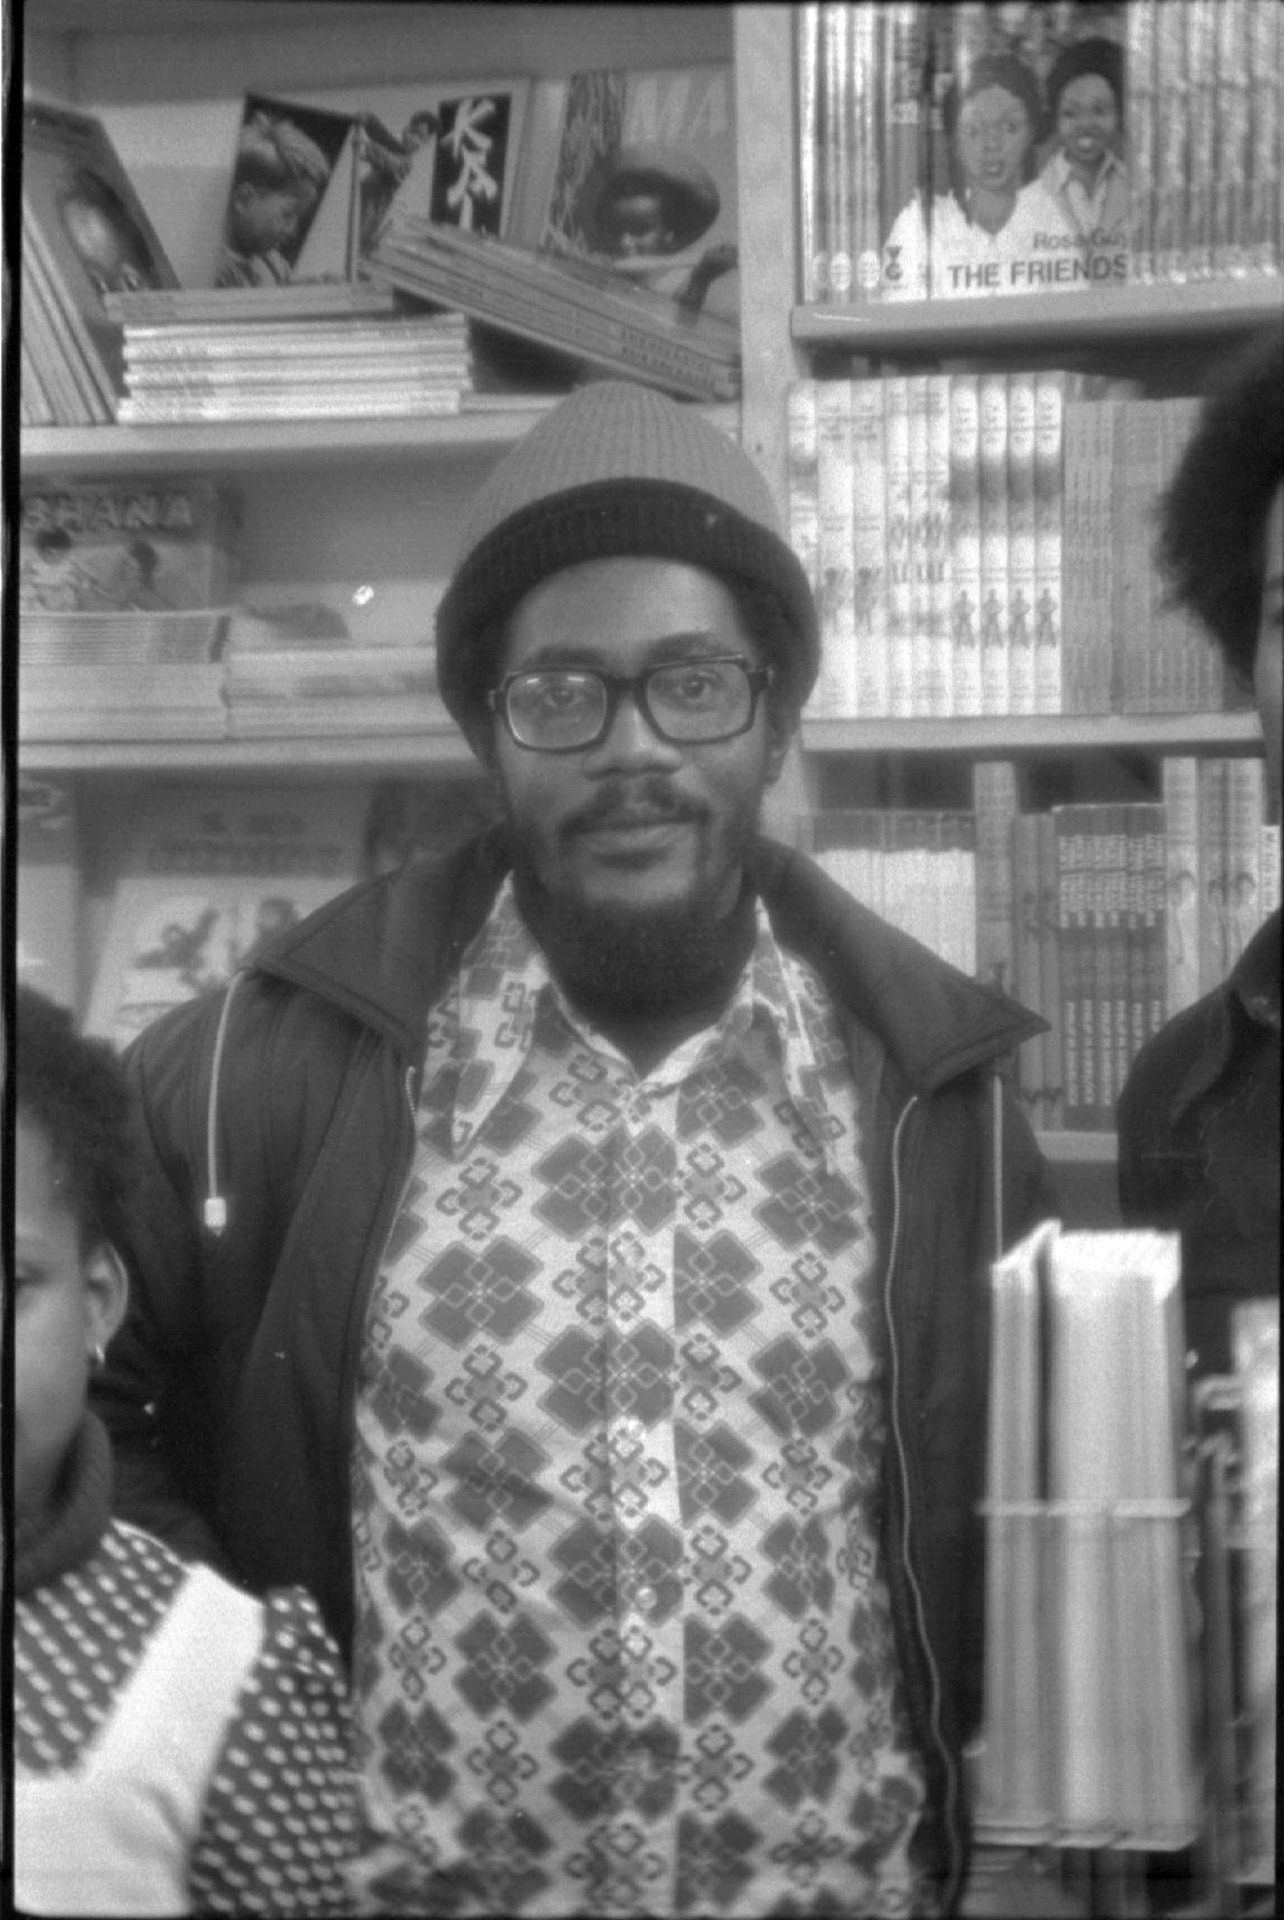 _09 Walter Rodney in Bogle-L'Ouverture Bookshop. c1970s. Huntley Archives at London Metropolitan Arc